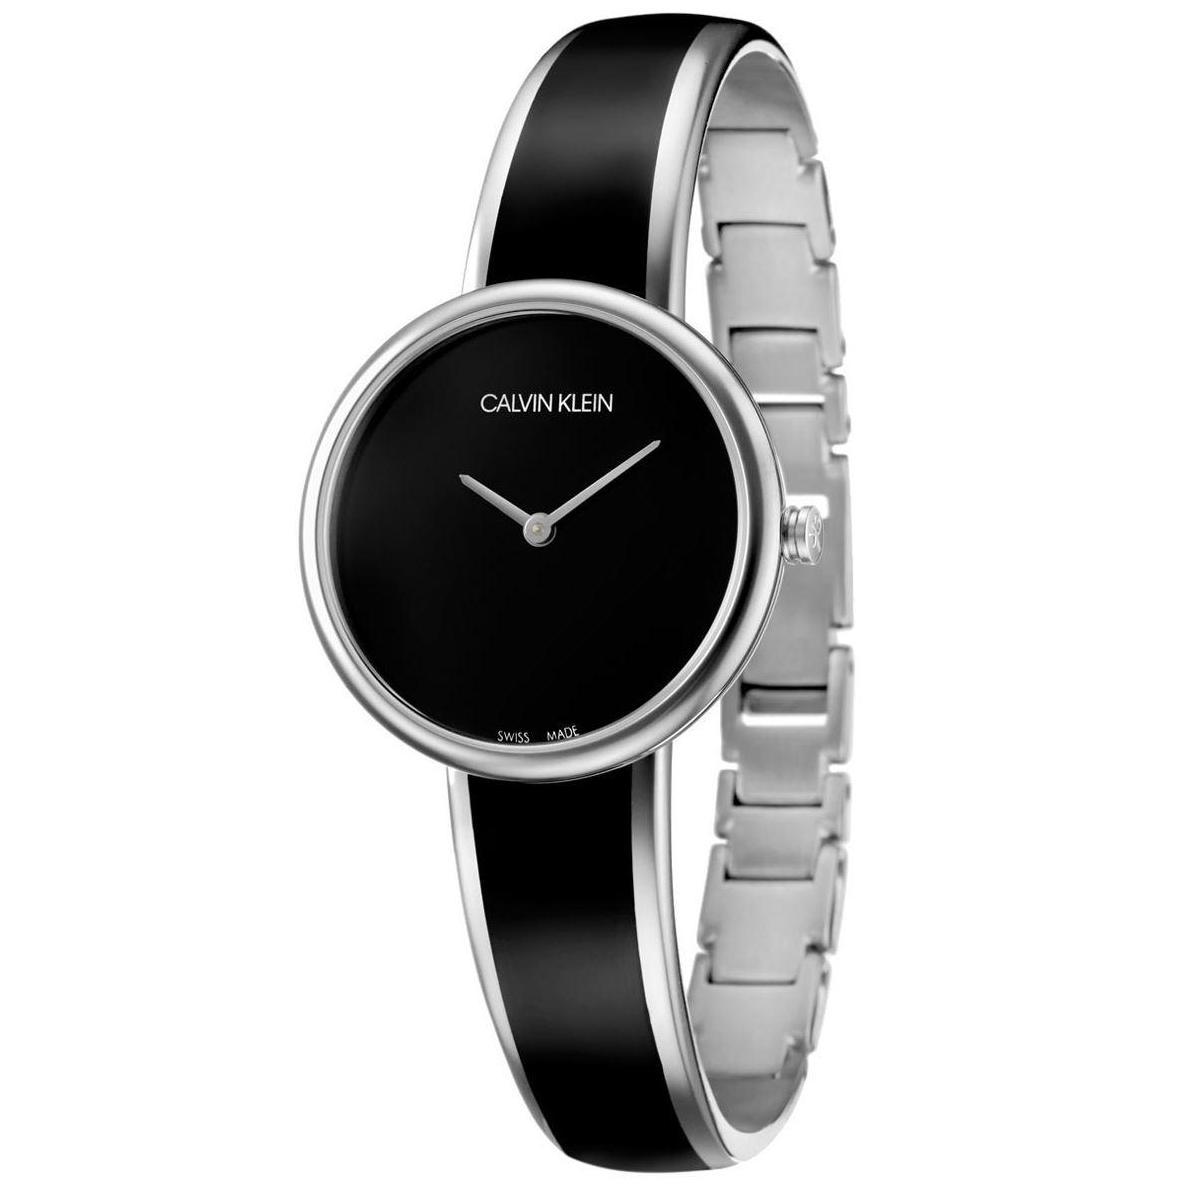 6542d77a7e Calvin Klein Seduce Quartz Black 30mm Dial Metal Bracelet with Black resin  Women's Watch K4E2N111